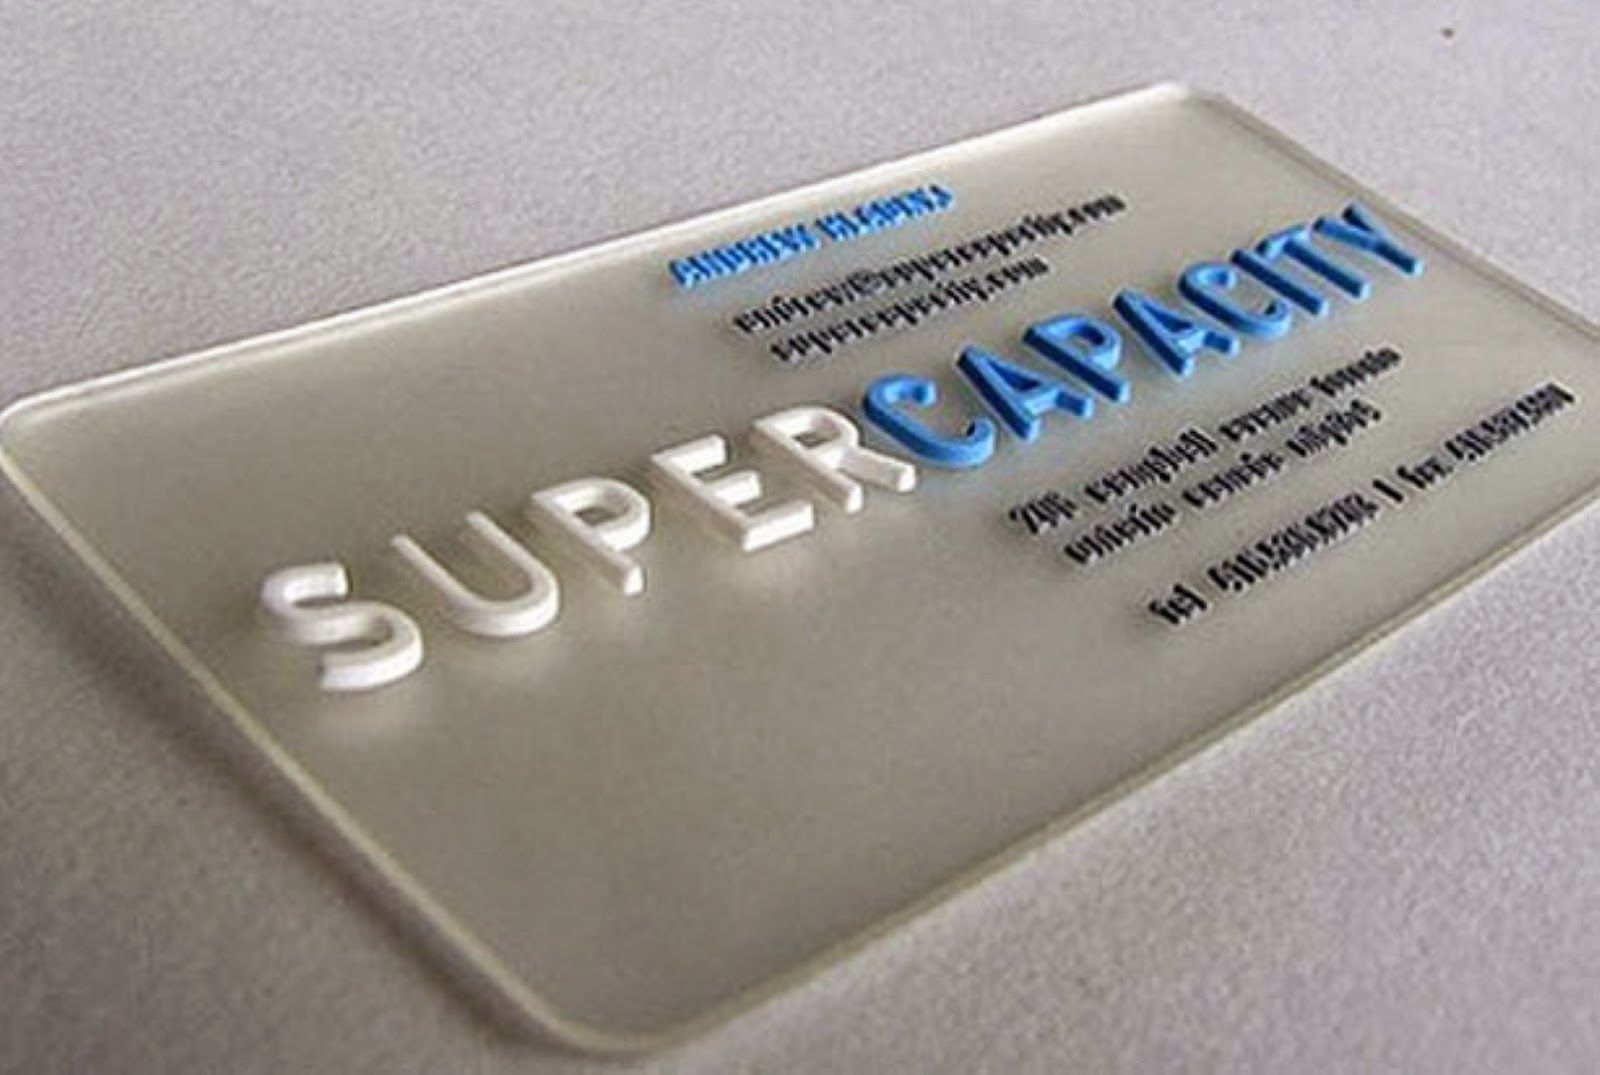 Interesantas vizītkartes (bussines card)